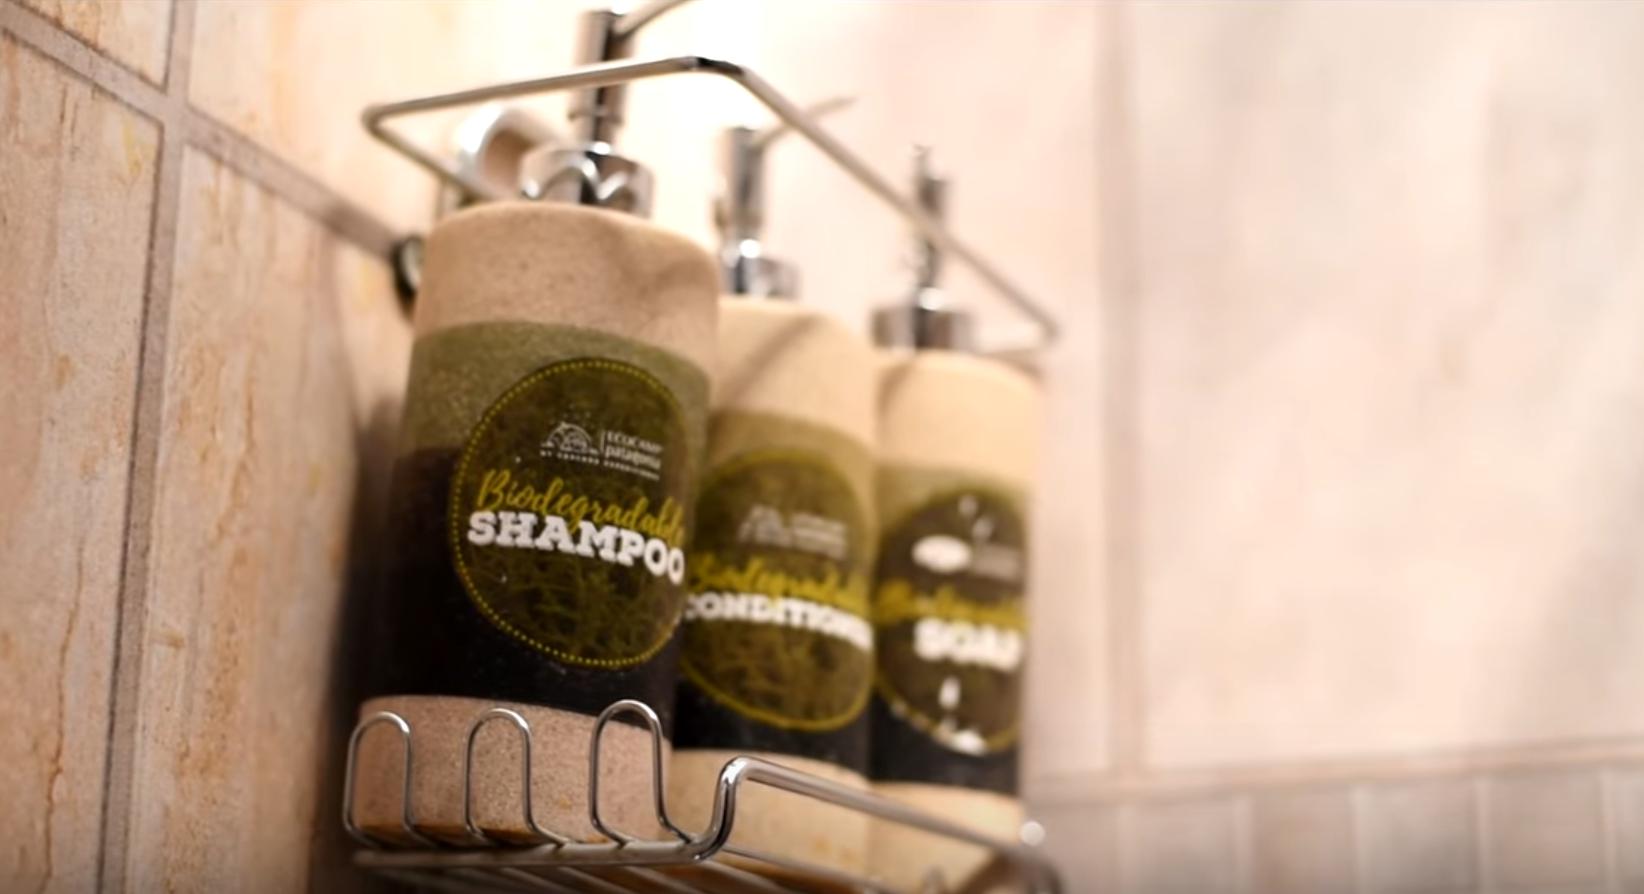 Biodegradable Shampoo